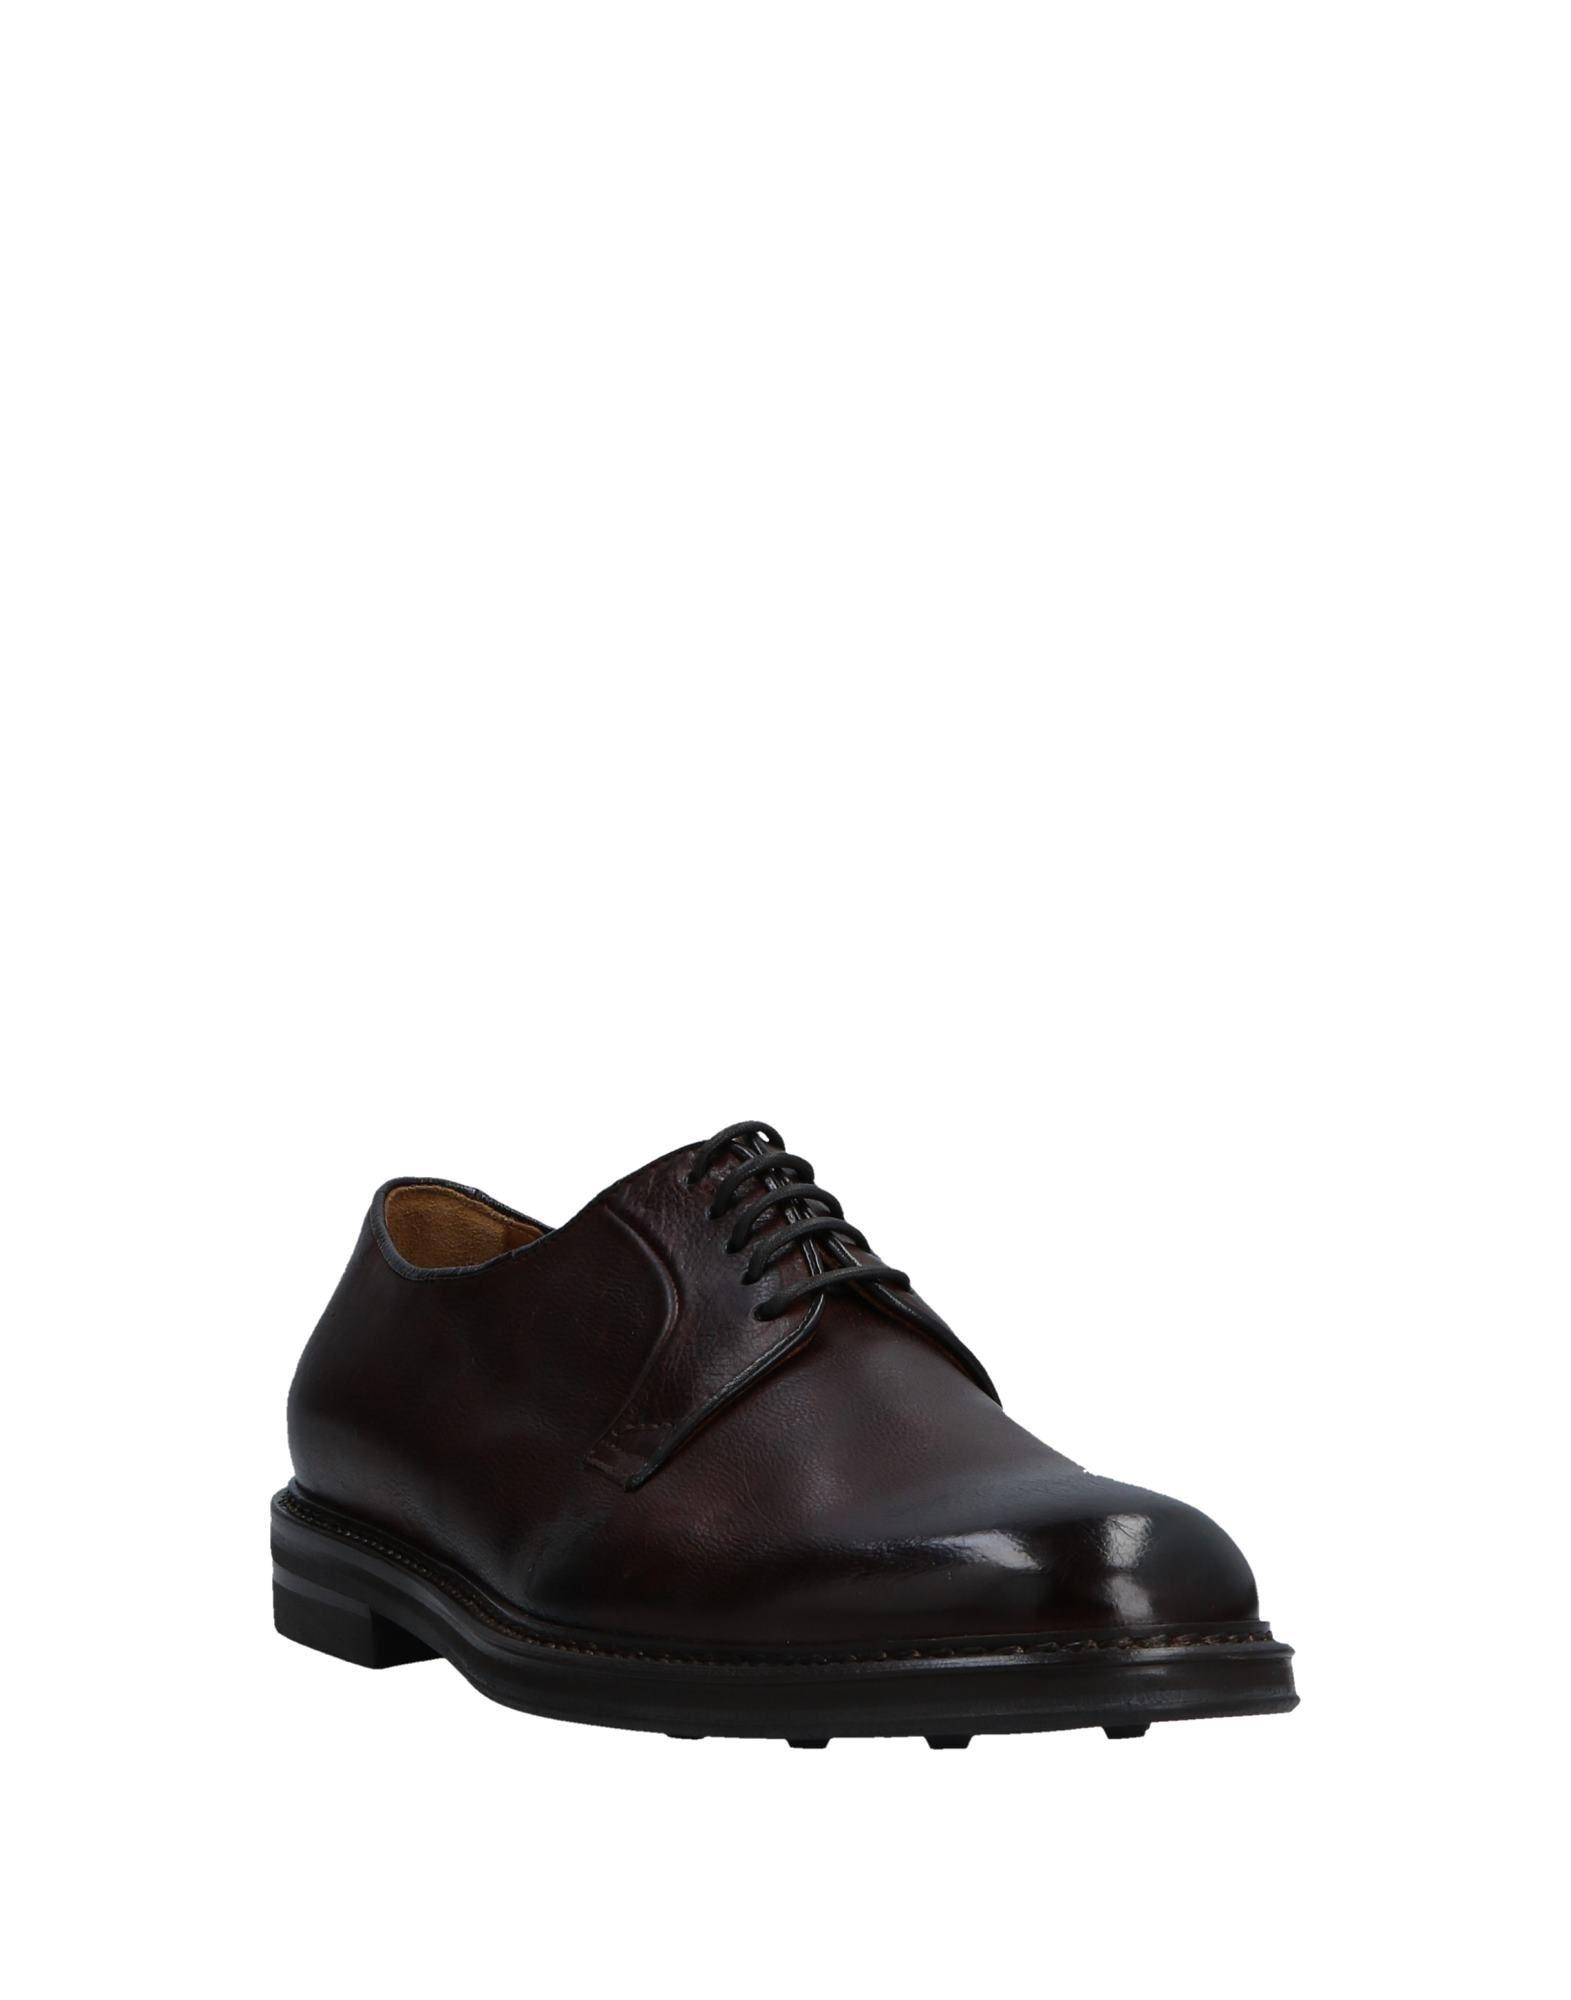 Doucal's Schnürschuhe Herren  11530495MN Heiße Schuhe 4bf0bf